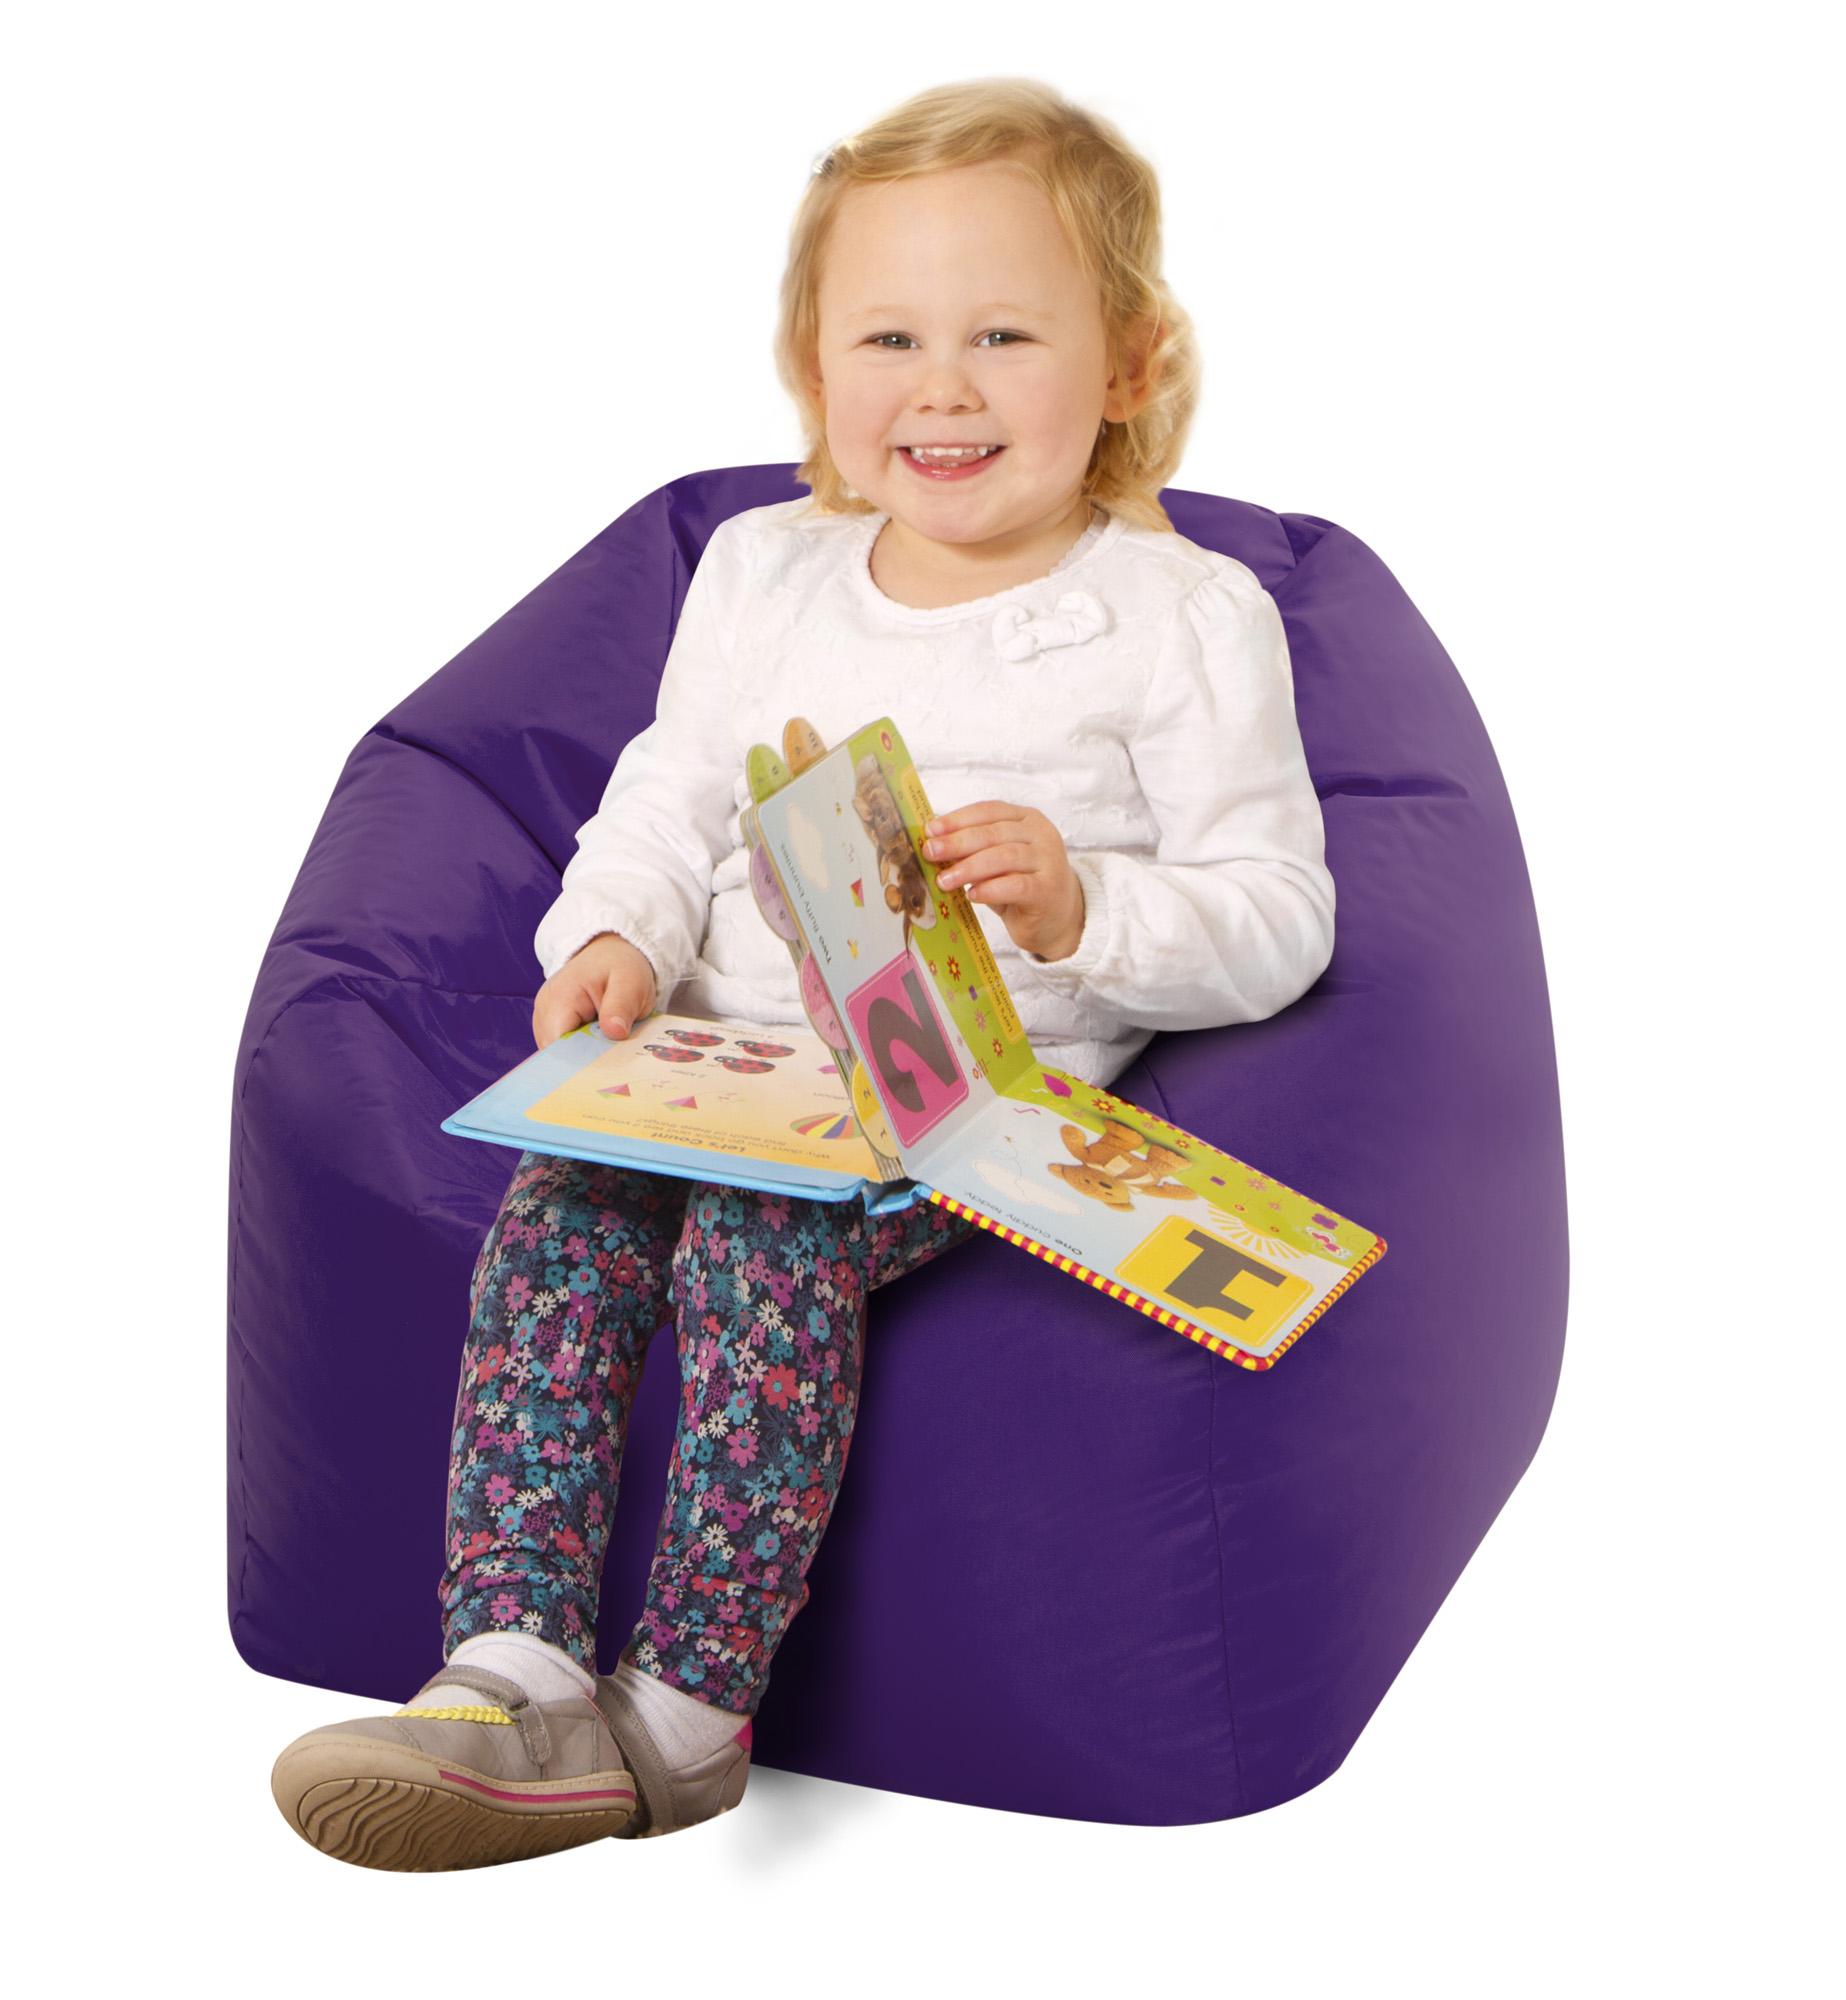 Eden-New-Nursery-Beanbag-purple-300dpi-1